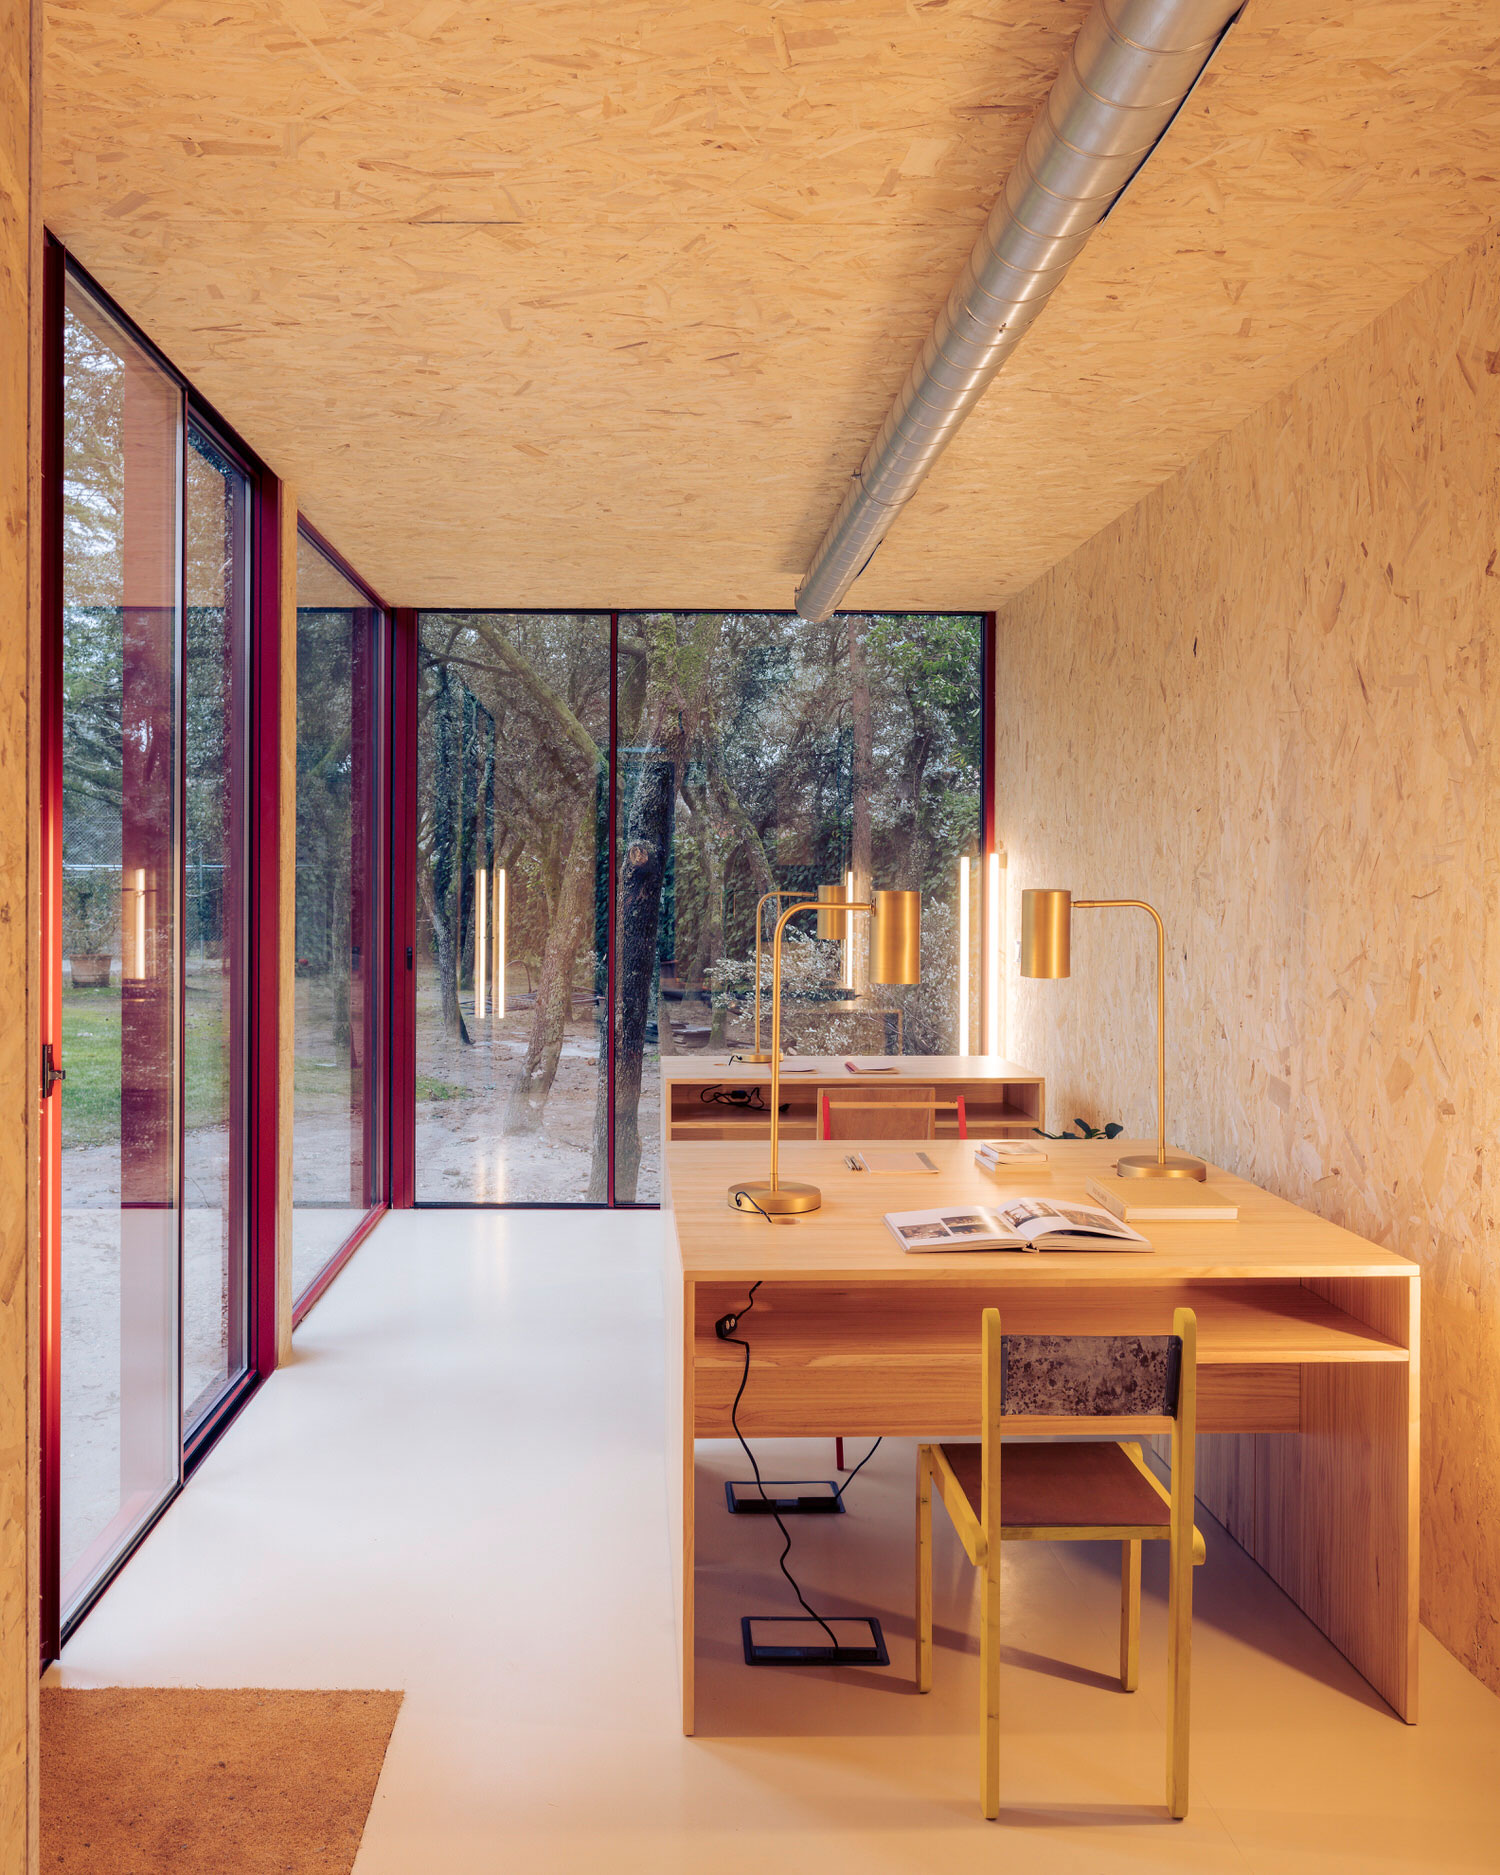 Ignacio De La Vega, Tini Office, Prefab Cabins, Corten Steel OSB Wood   Yellowtrace